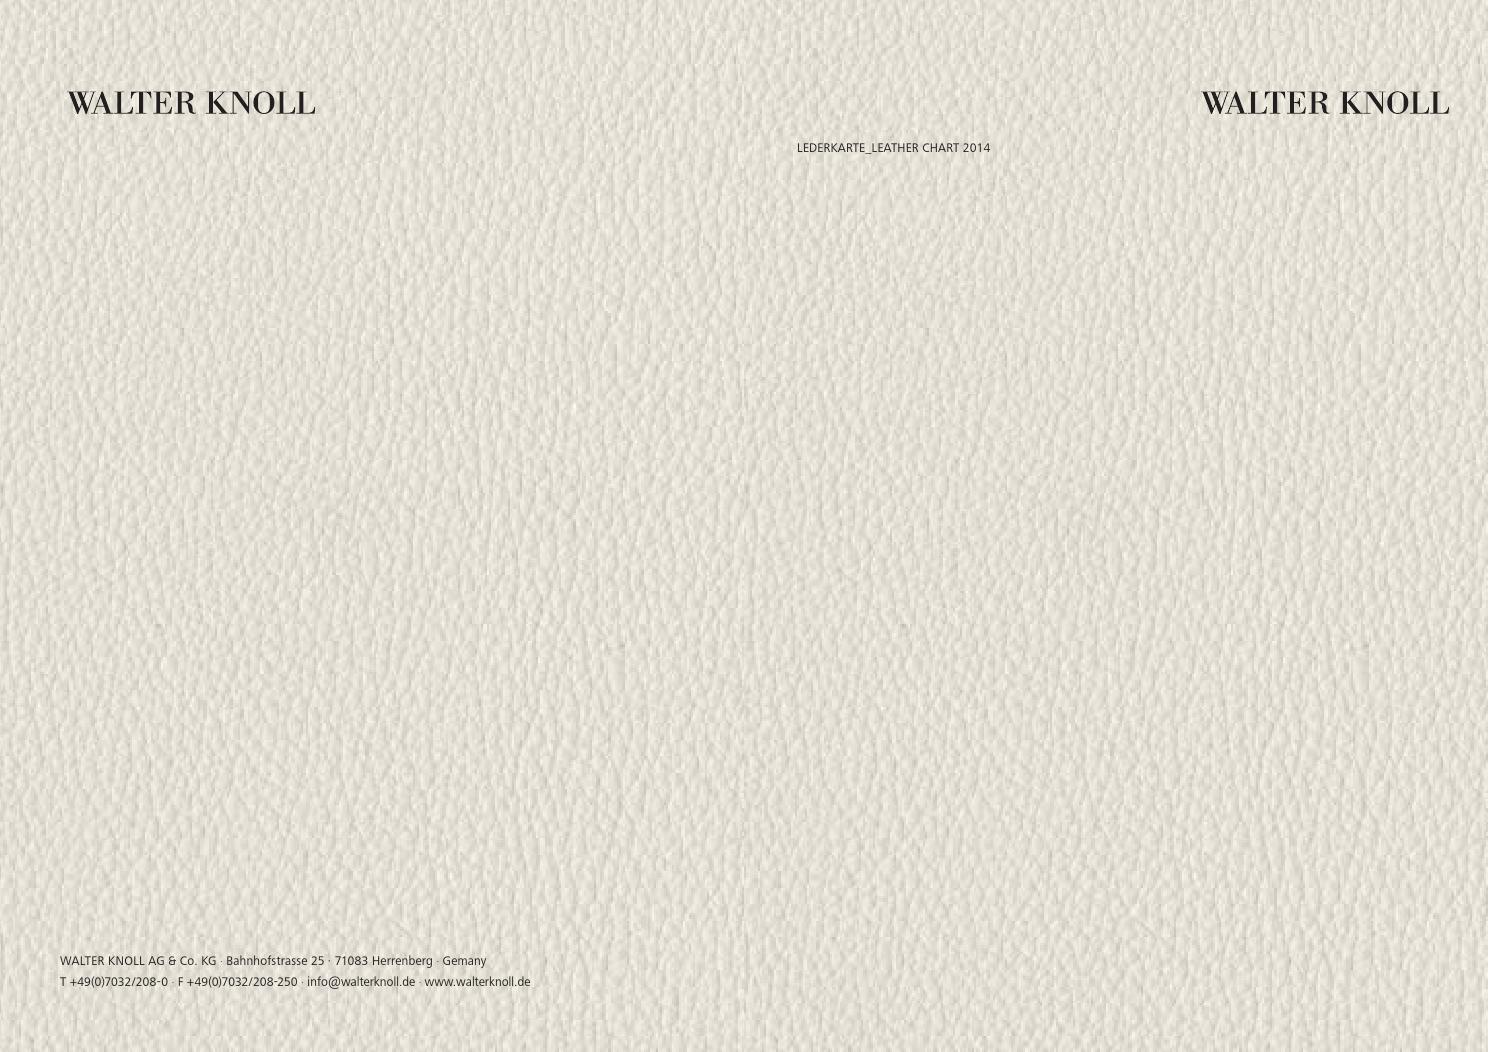 lederkarte leather chart 2014 by wipper buerodesign gmbh issuu. Black Bedroom Furniture Sets. Home Design Ideas